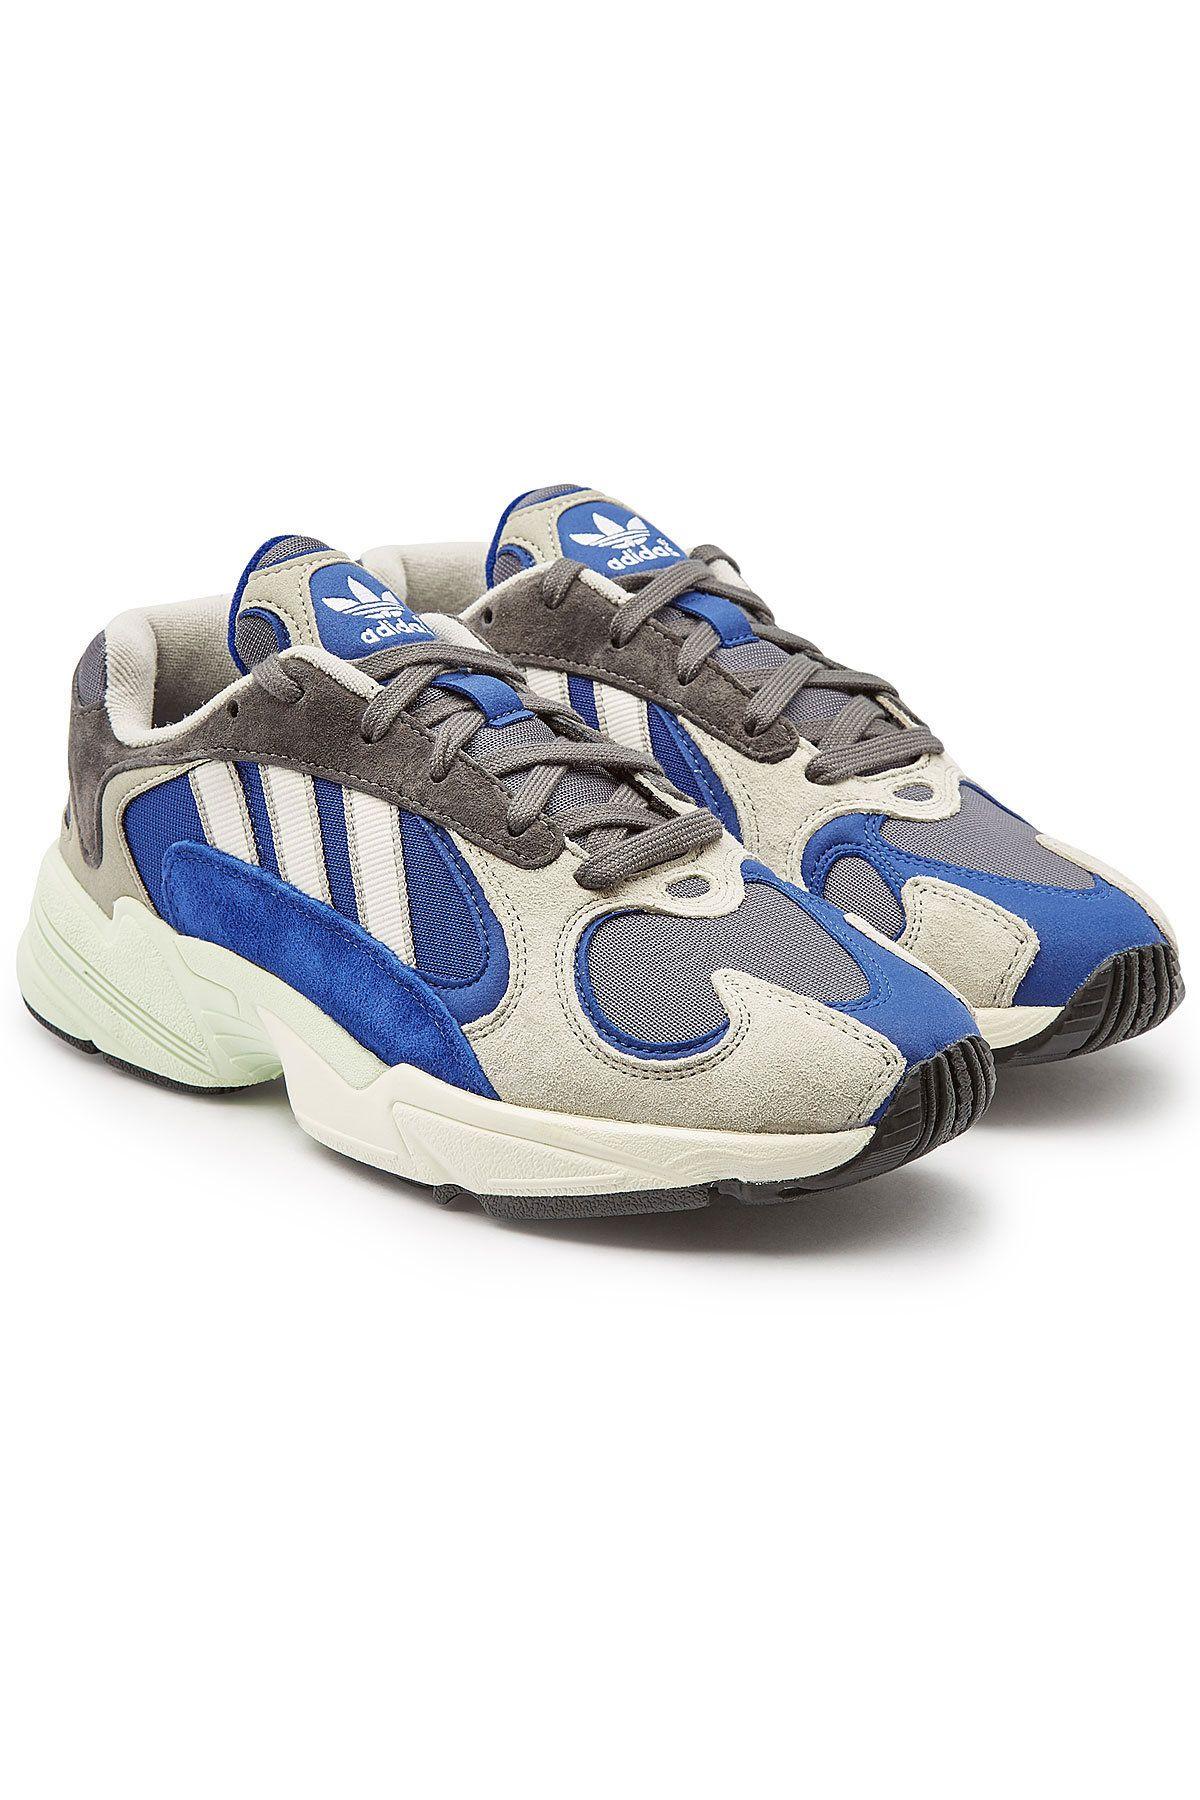 new concept d73ec e0dfb ADIDAS ORIGINALS YUNG 1 SNEAKERS WITH SUEDE.  adidasoriginals  shoes